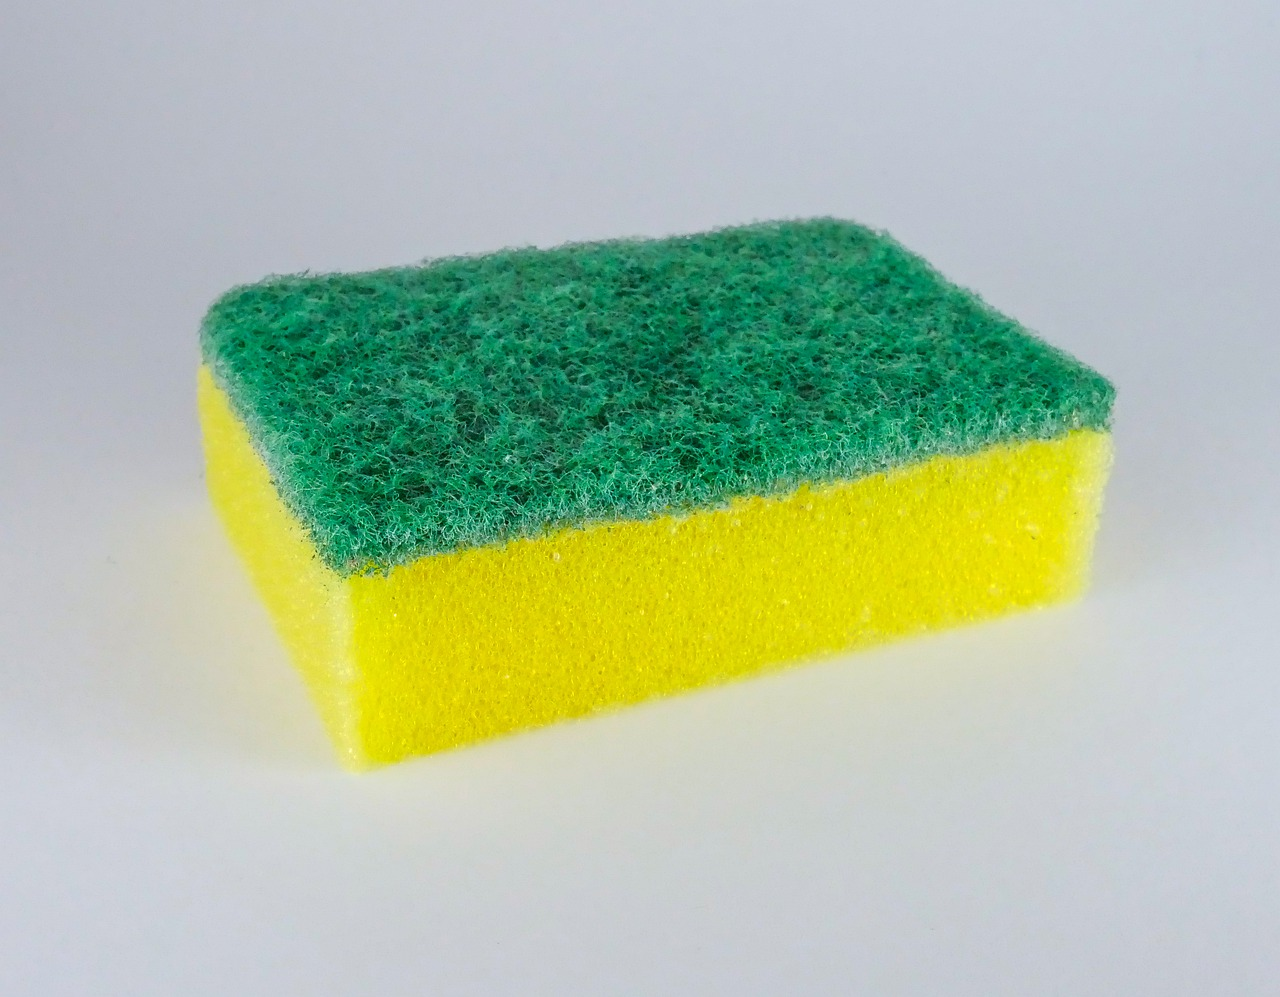 sponge-4501300_1280